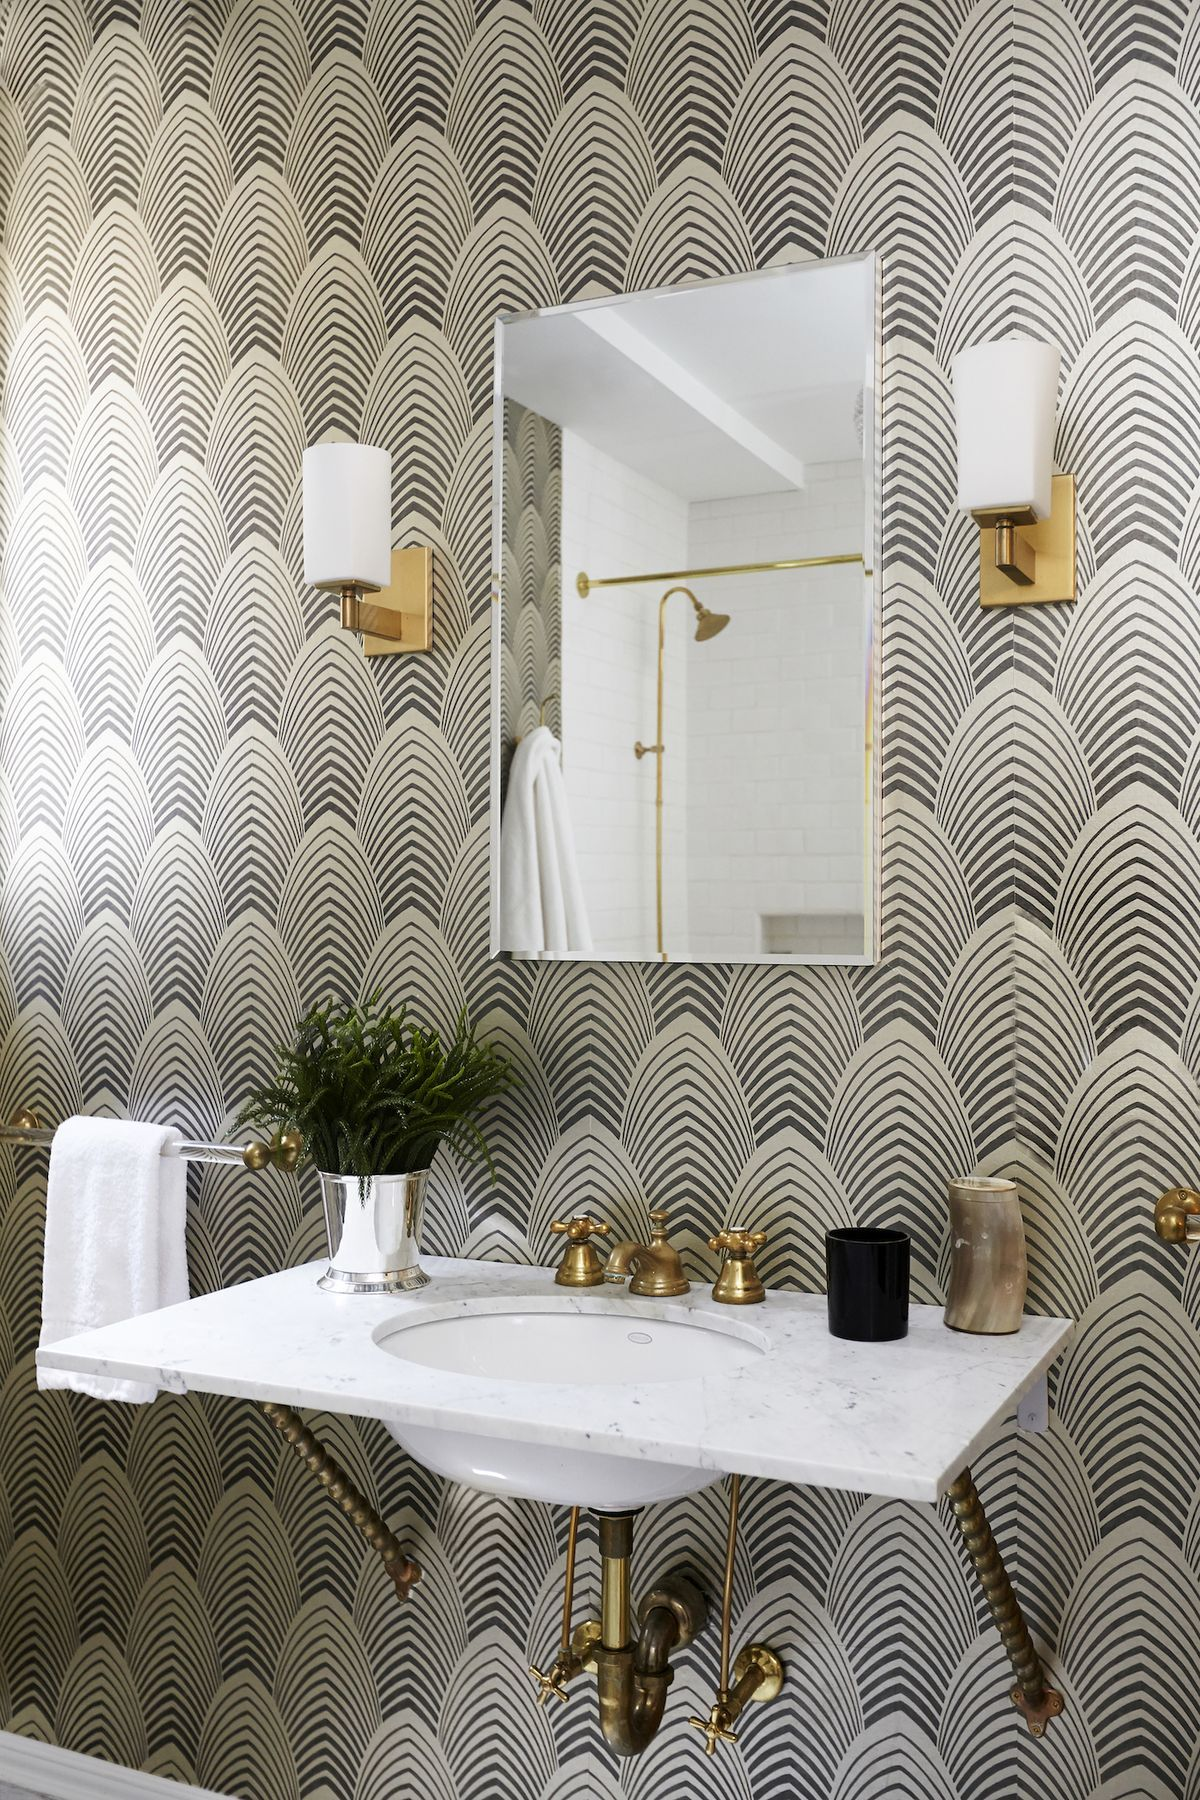 sleek bathroom with brass fixtures deco inspired wallpaper bold rh pinterest com